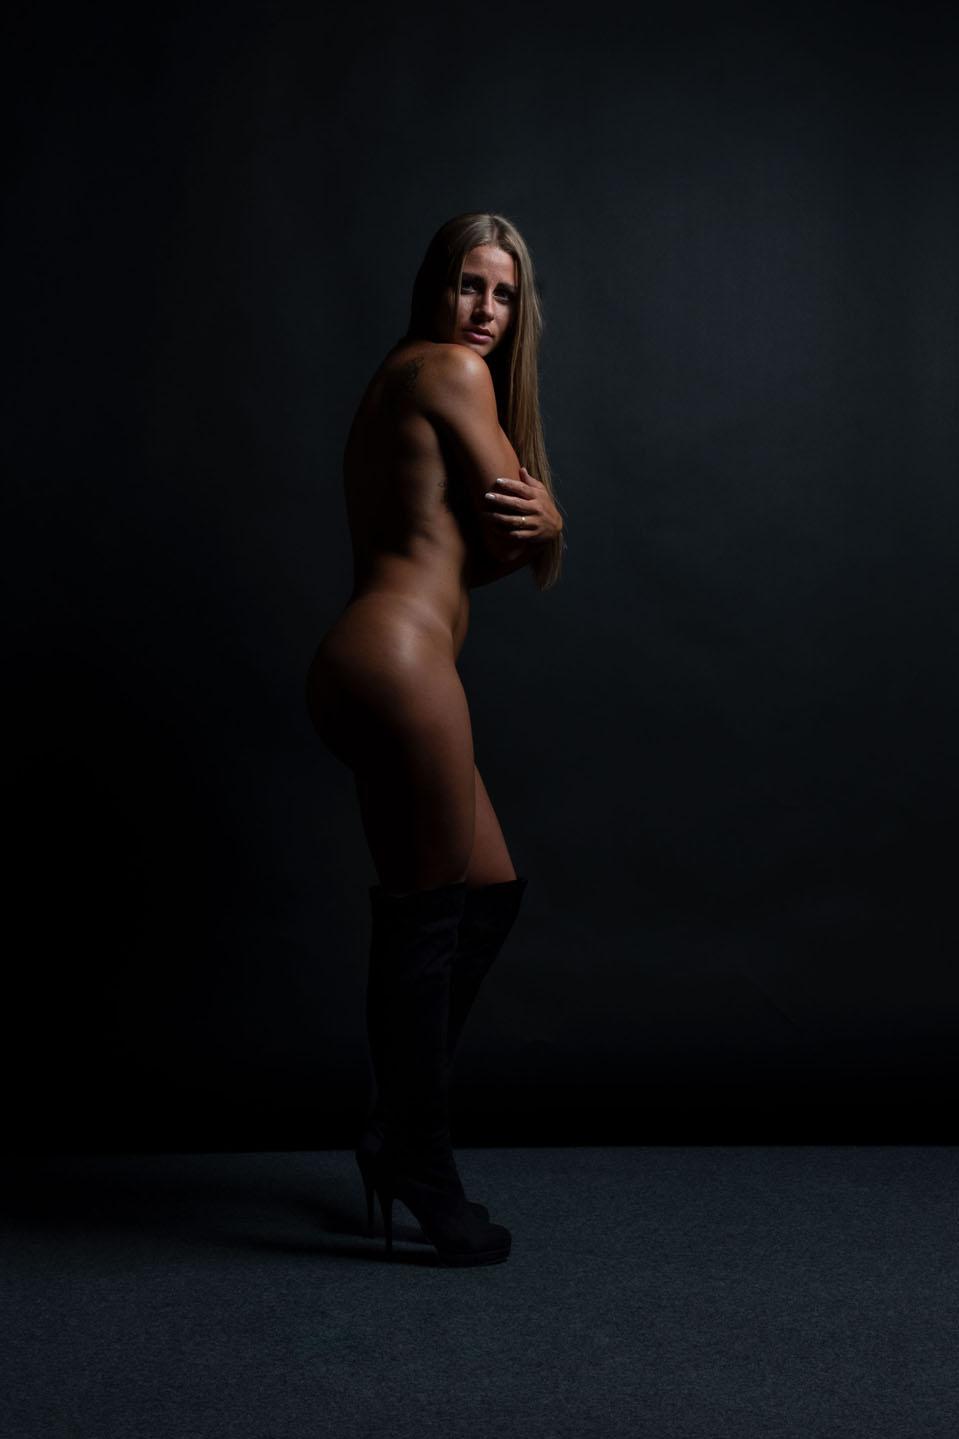 Valentina_Zamperoni_077